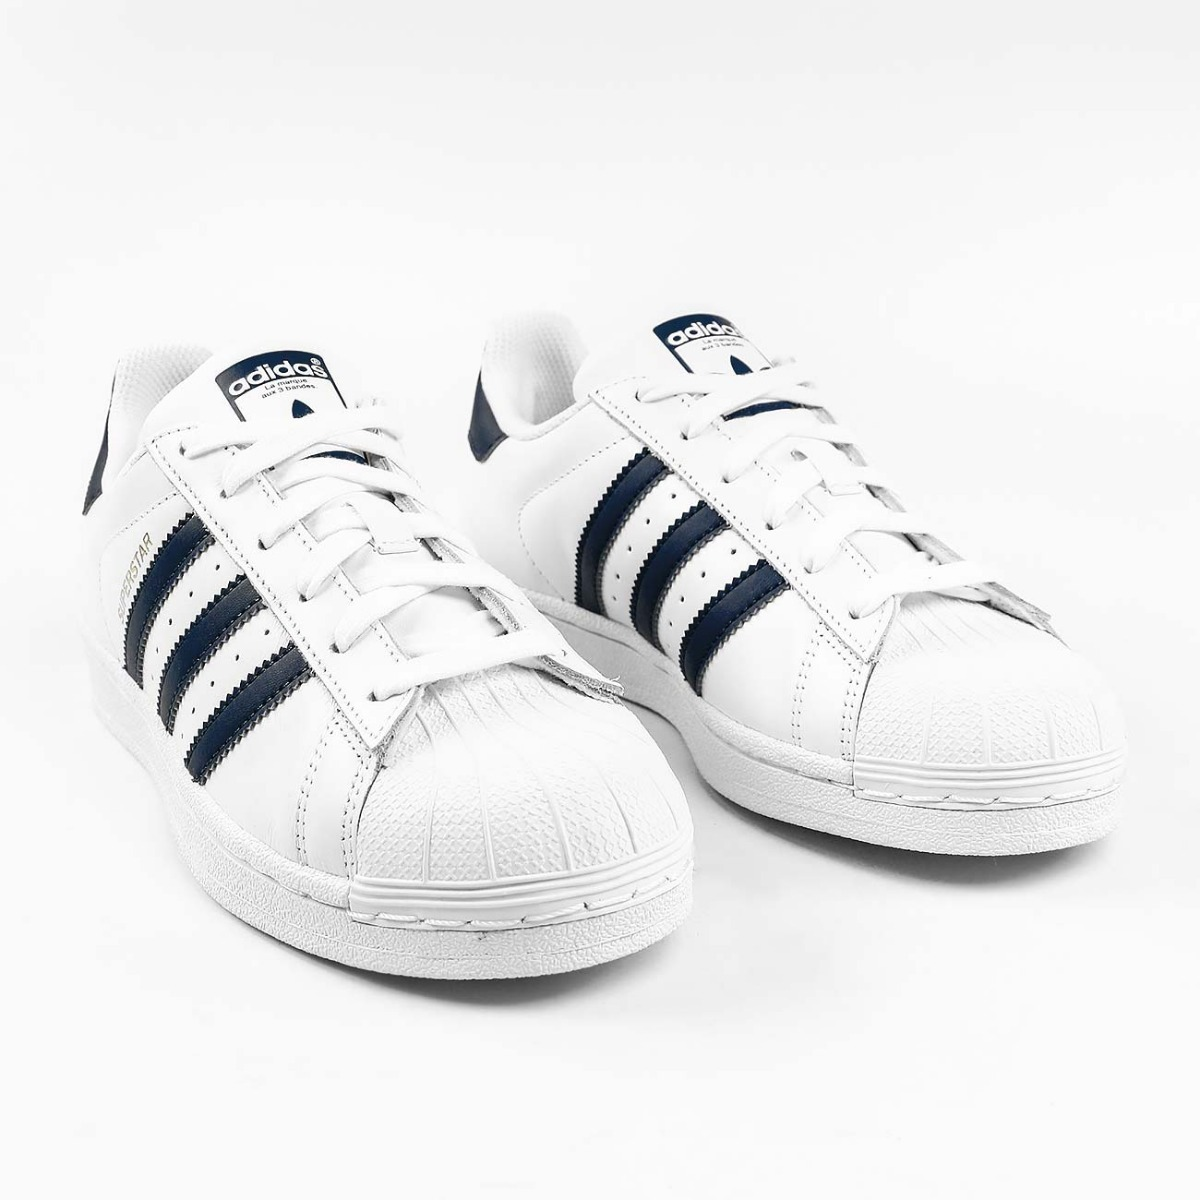 half off 1c74f e012a Zapatillas adidas Superstar Cm8082